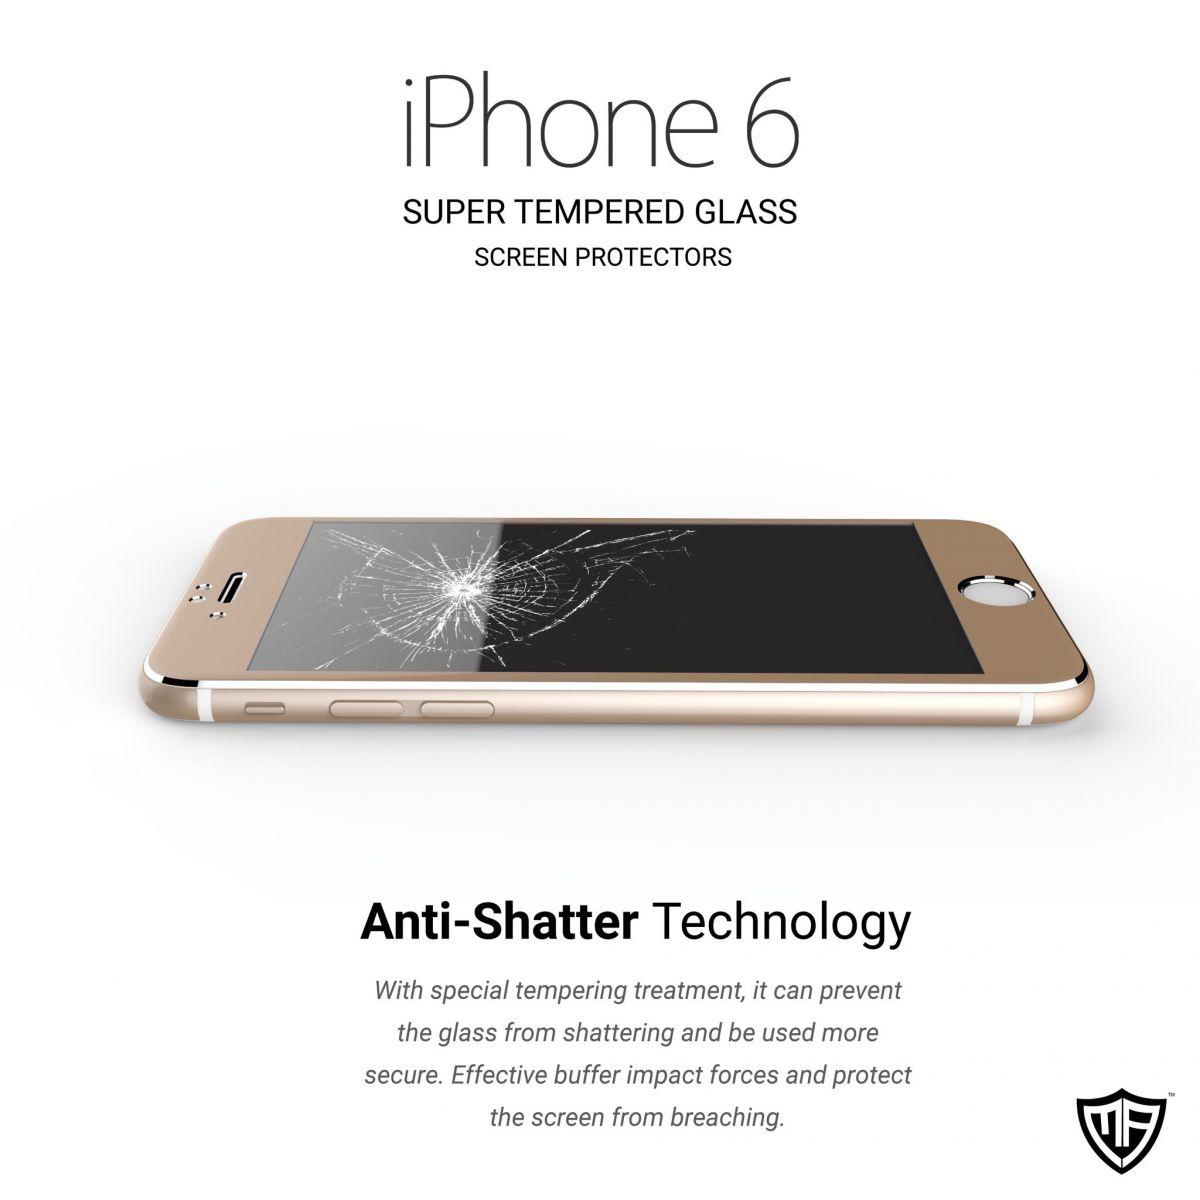 3D ochranné sklo pro Apple iPhone 6s/6 a iPhone 6s/6 Plus.